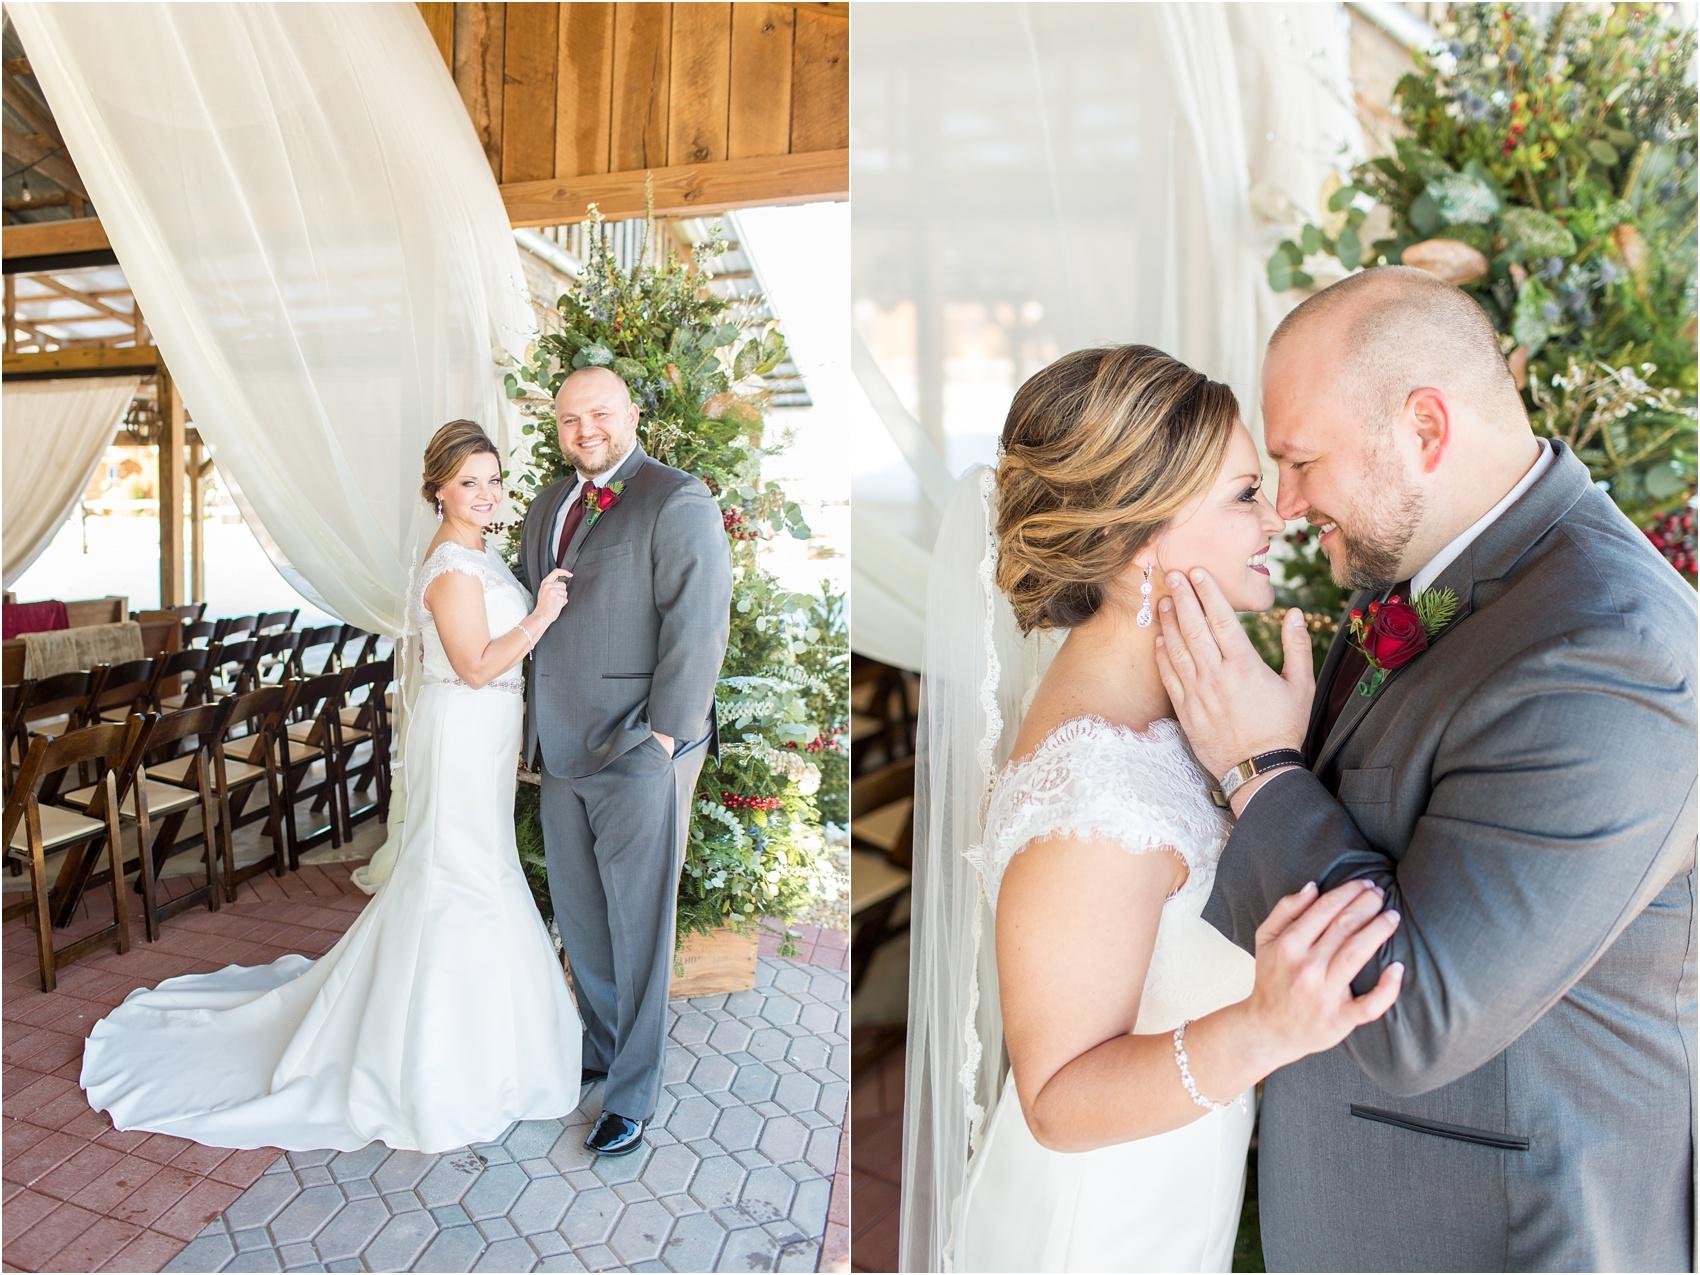 Savannah Eve Photography- Page Wedding Blog-33.jpg